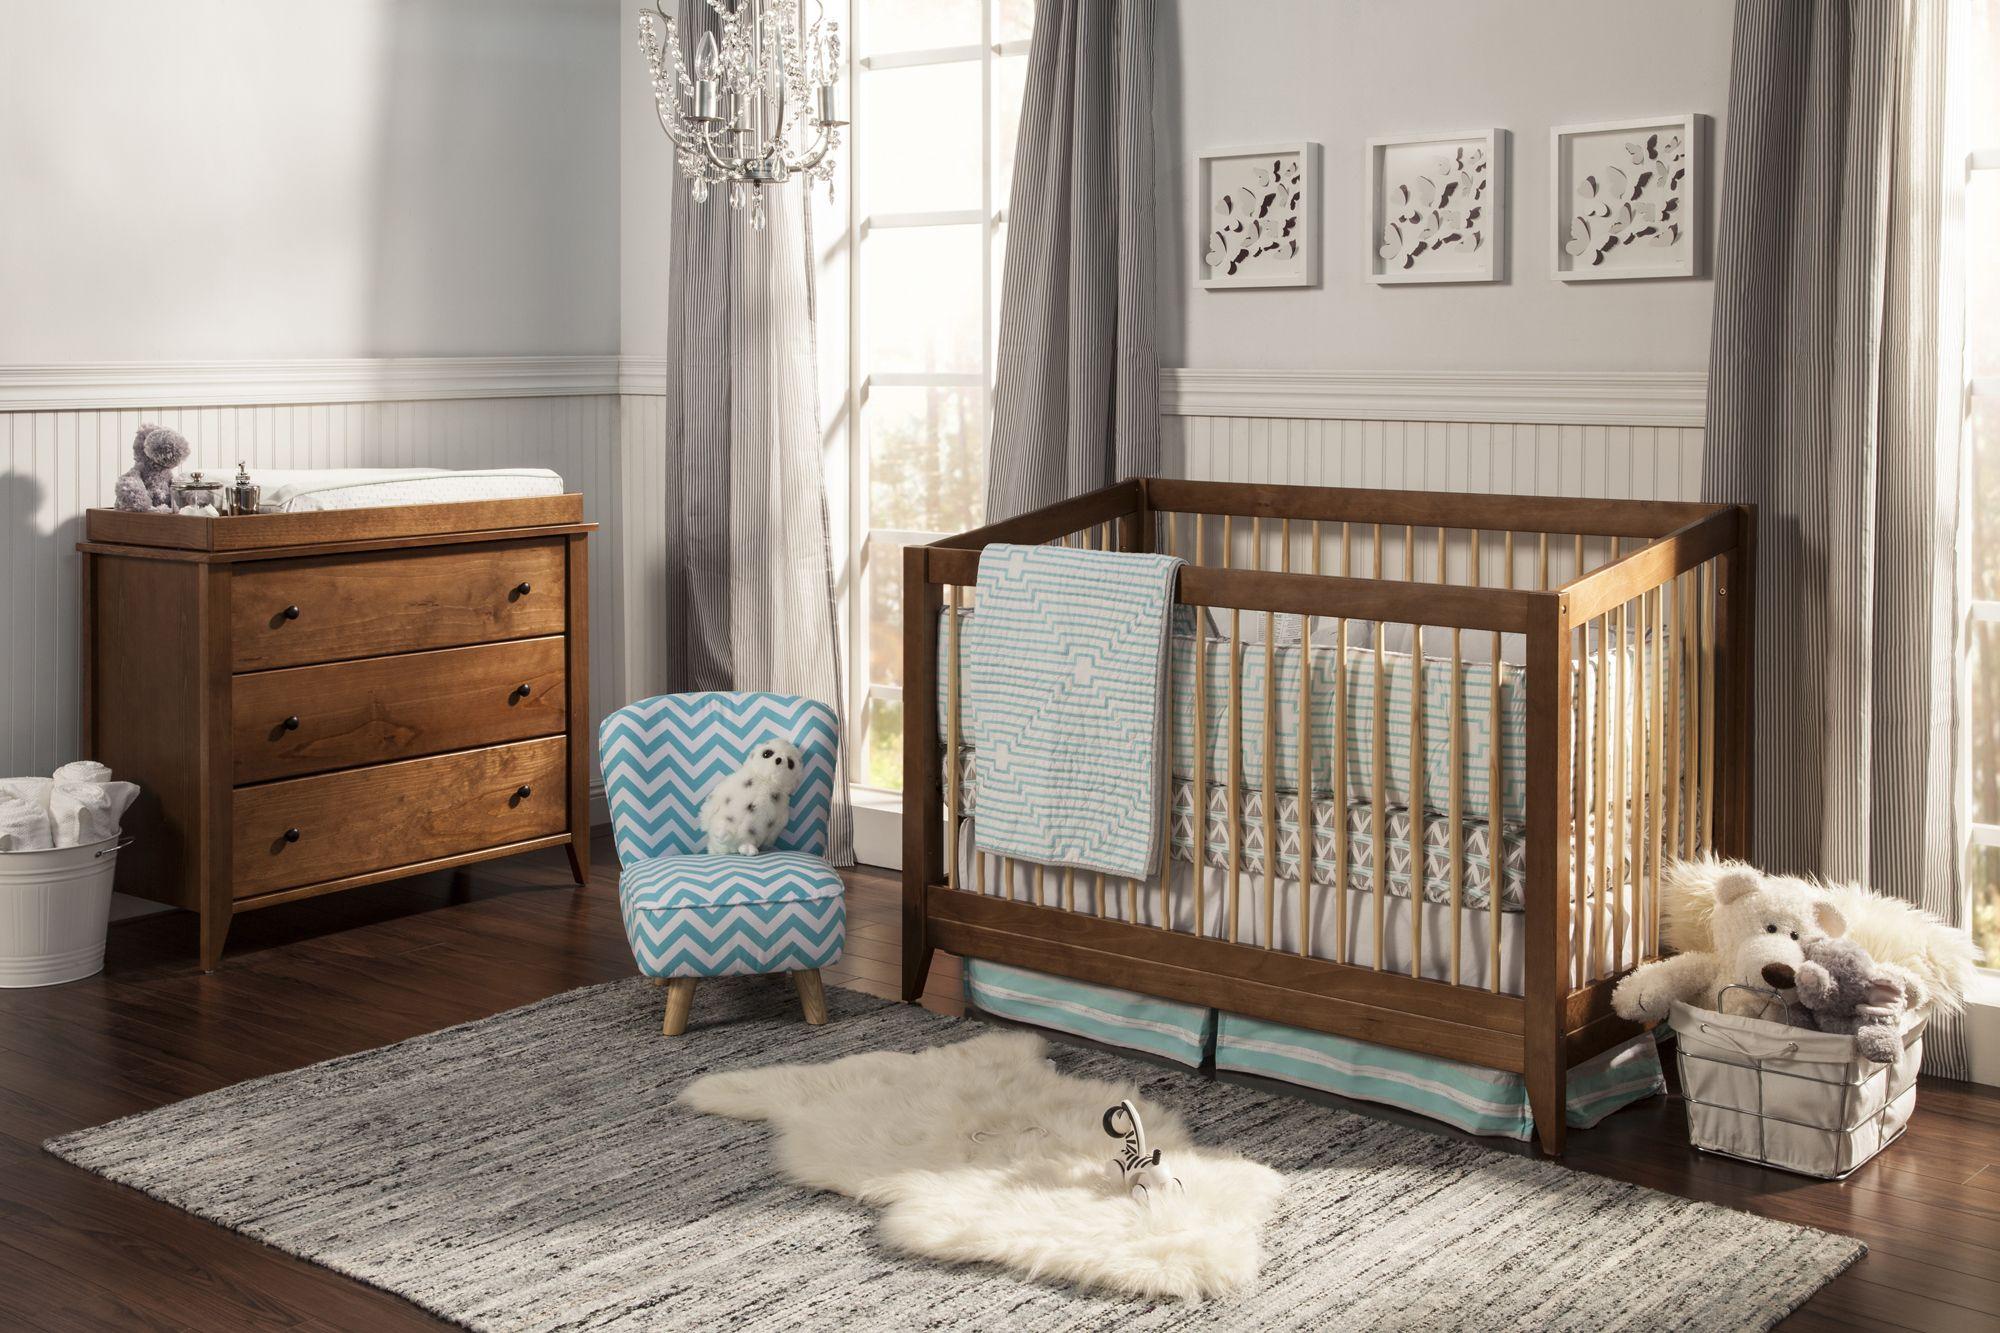 My New Nursery Set Highland 4 In 1 Convertible Crib With Toddler Rail Davinci Baby